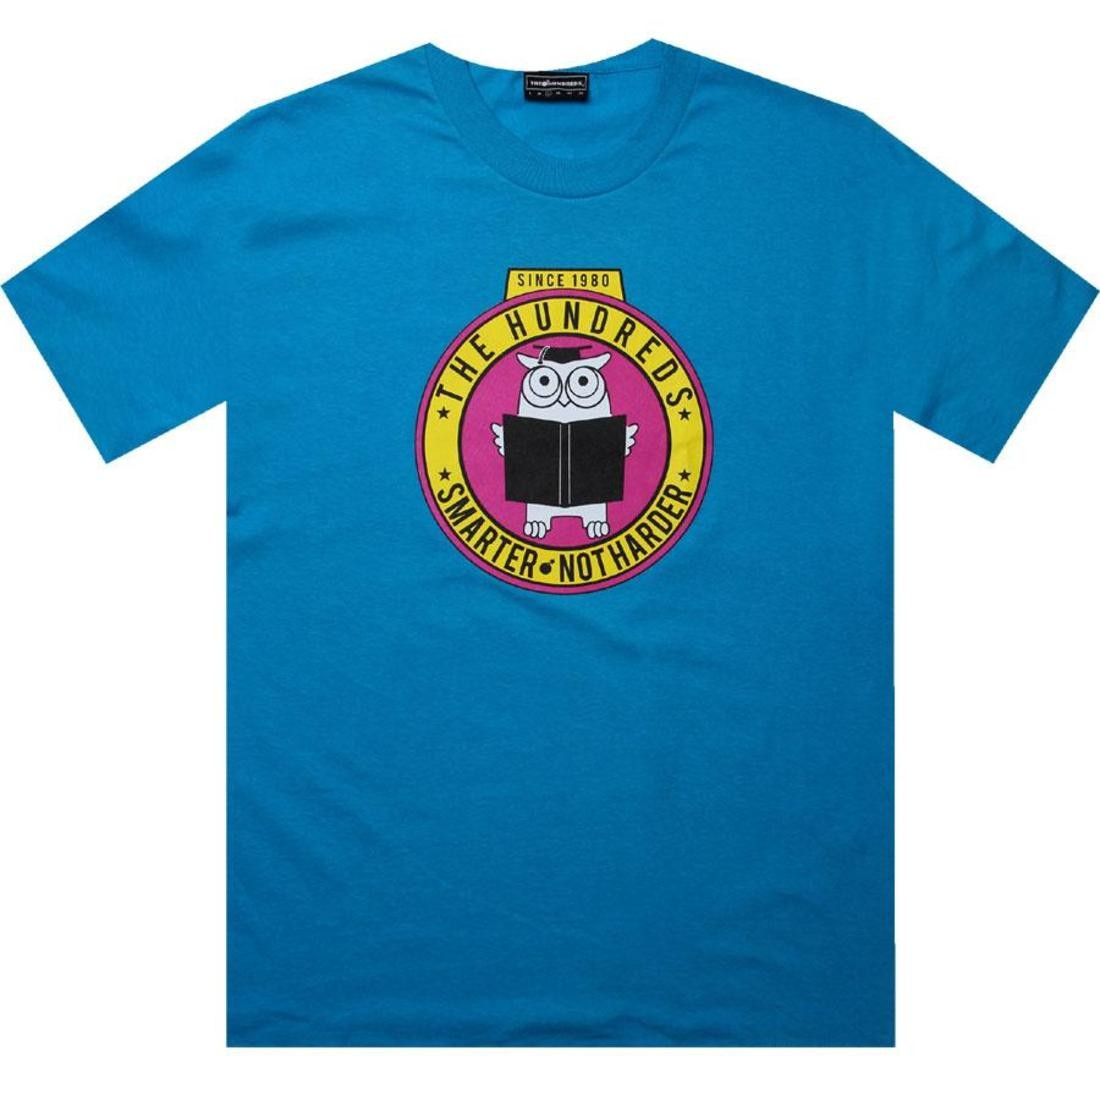 Tシャツ 【 THE HUNDREDS SMARTER TEE TURQUOISE 】 メンズファッション トップス Tシャツ カットソー